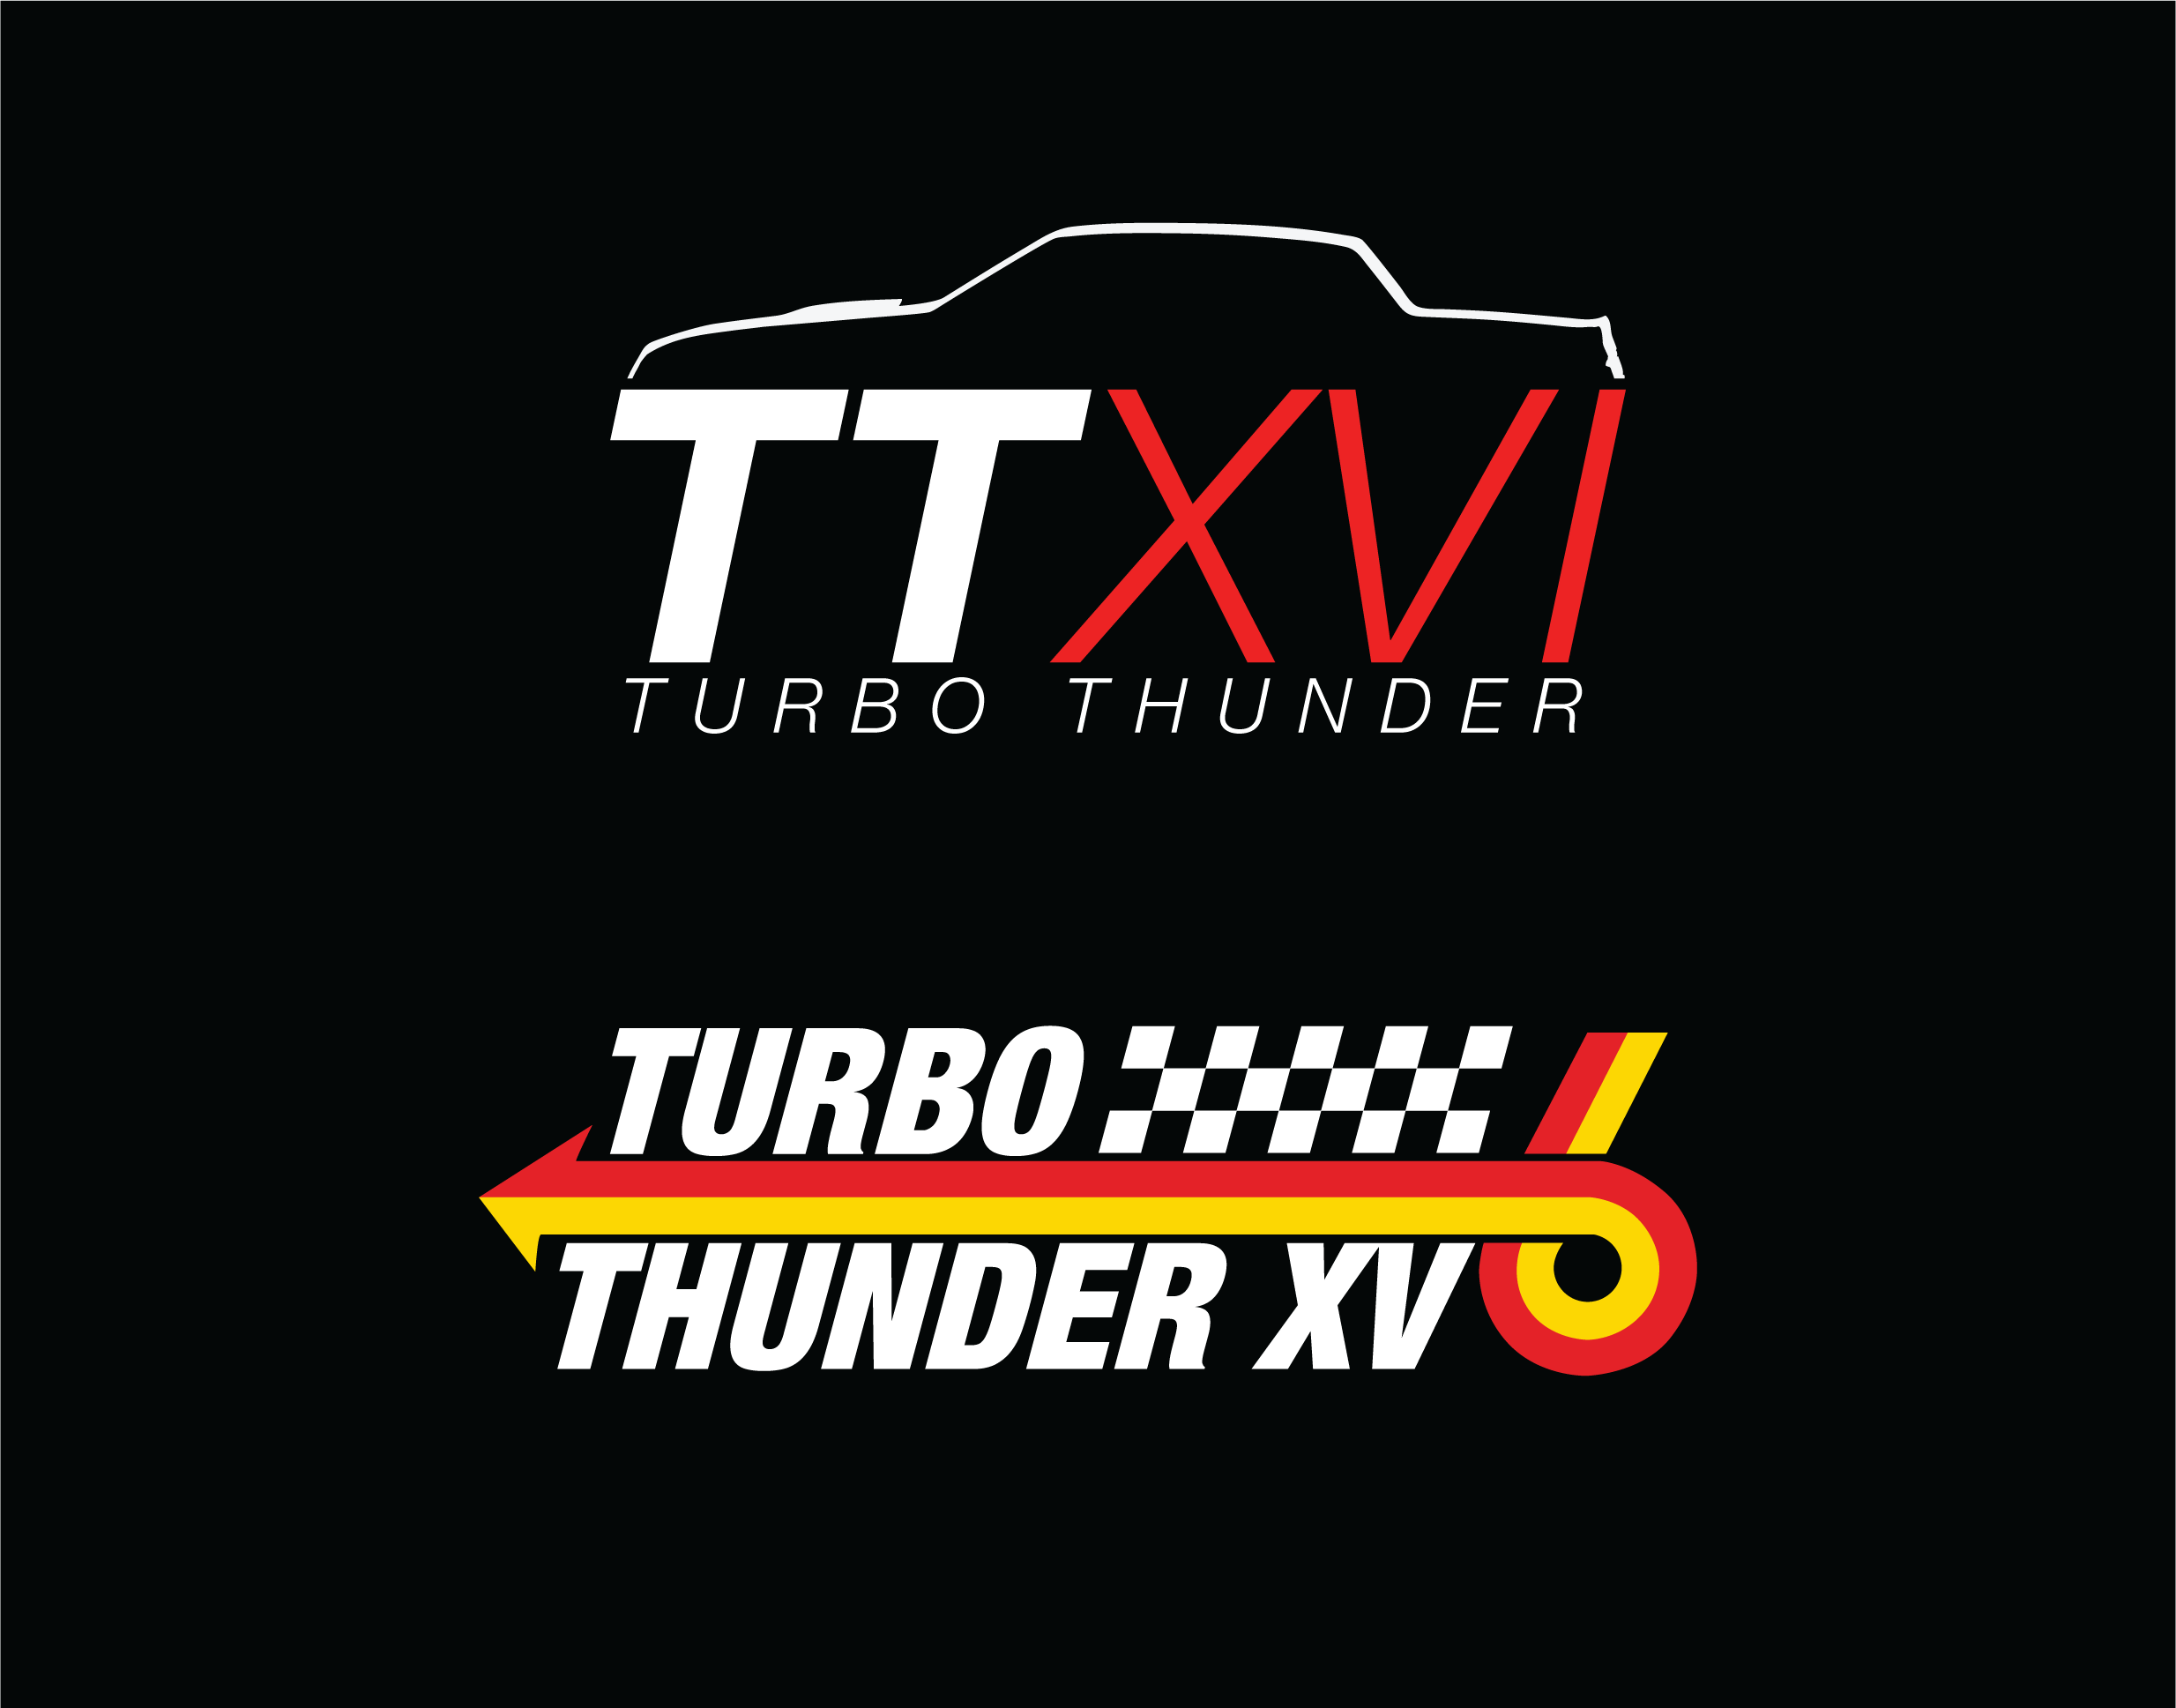 Turbo Thunder Logos